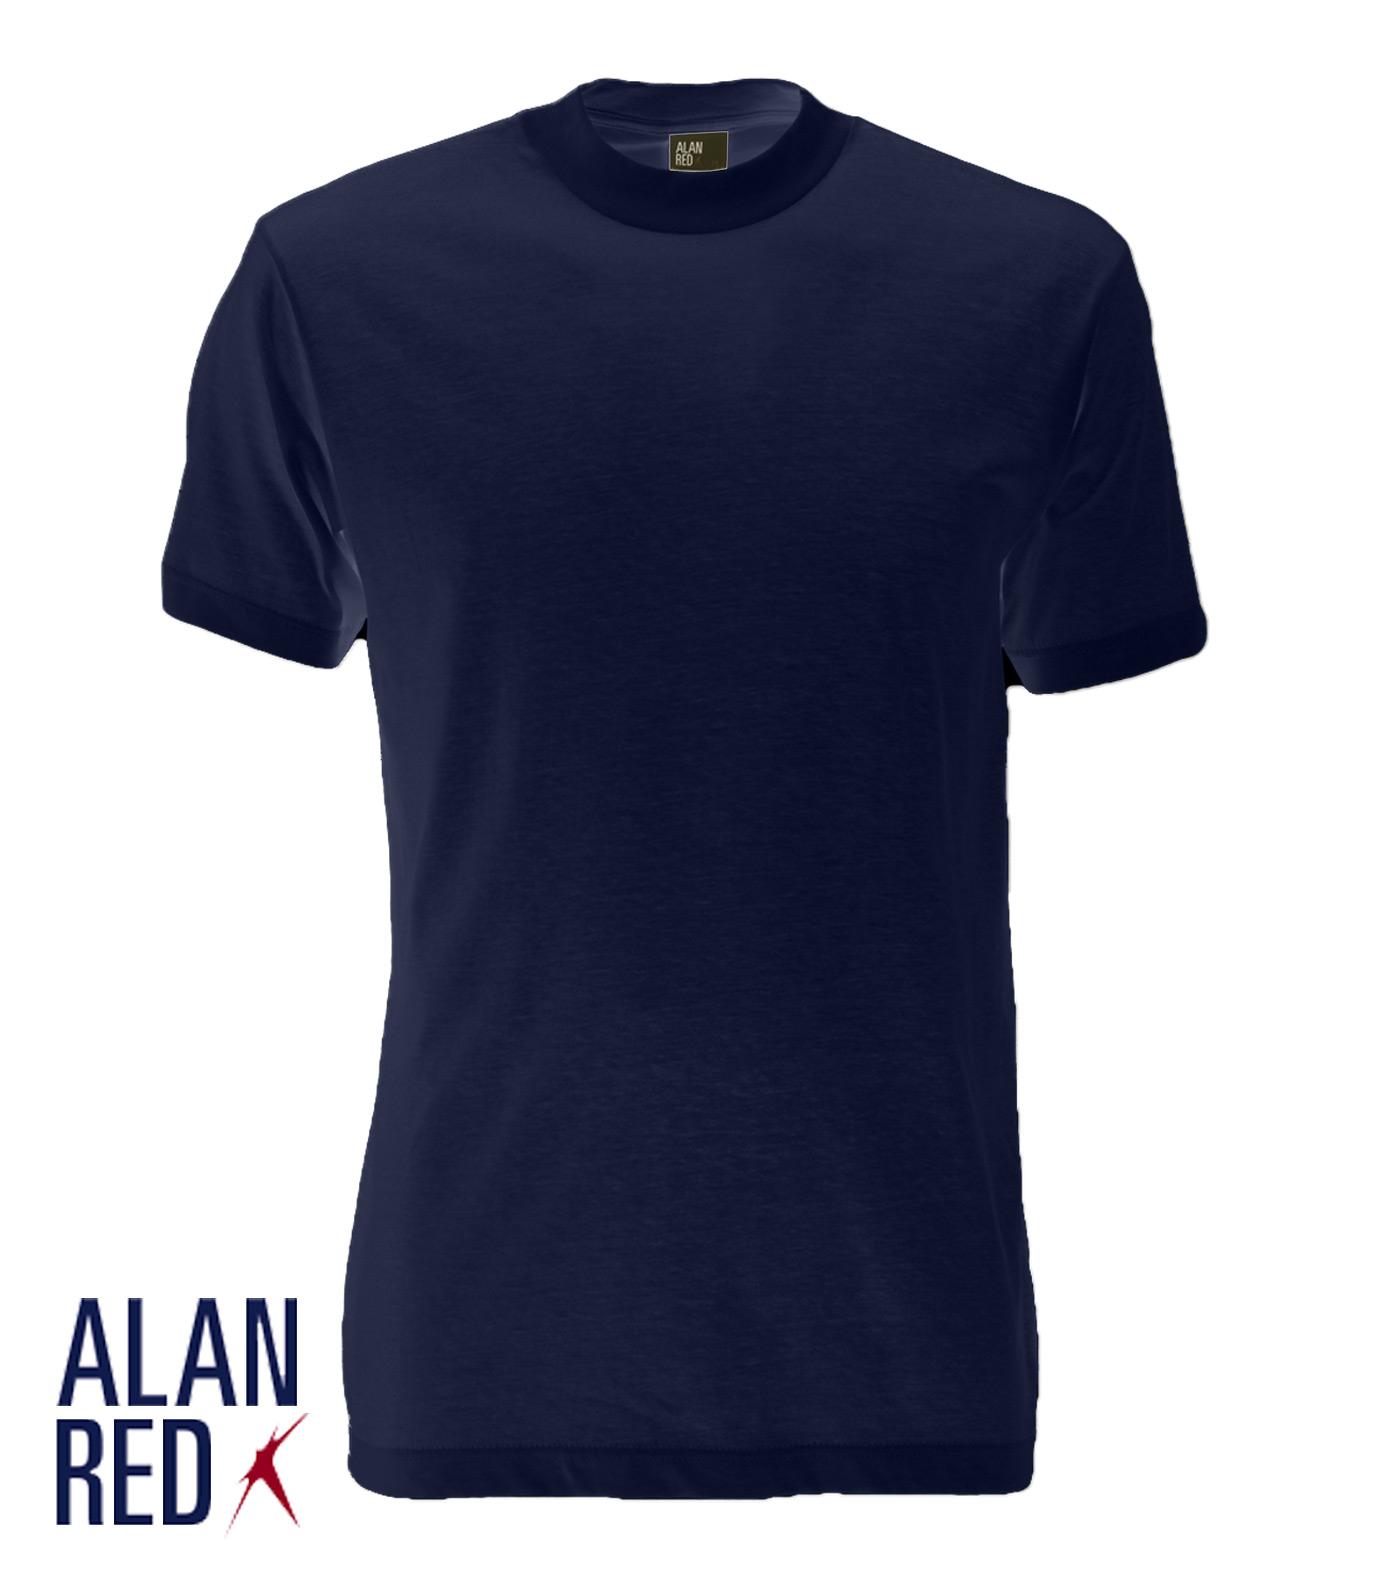 Alan Red Virginia - navy 1-pack